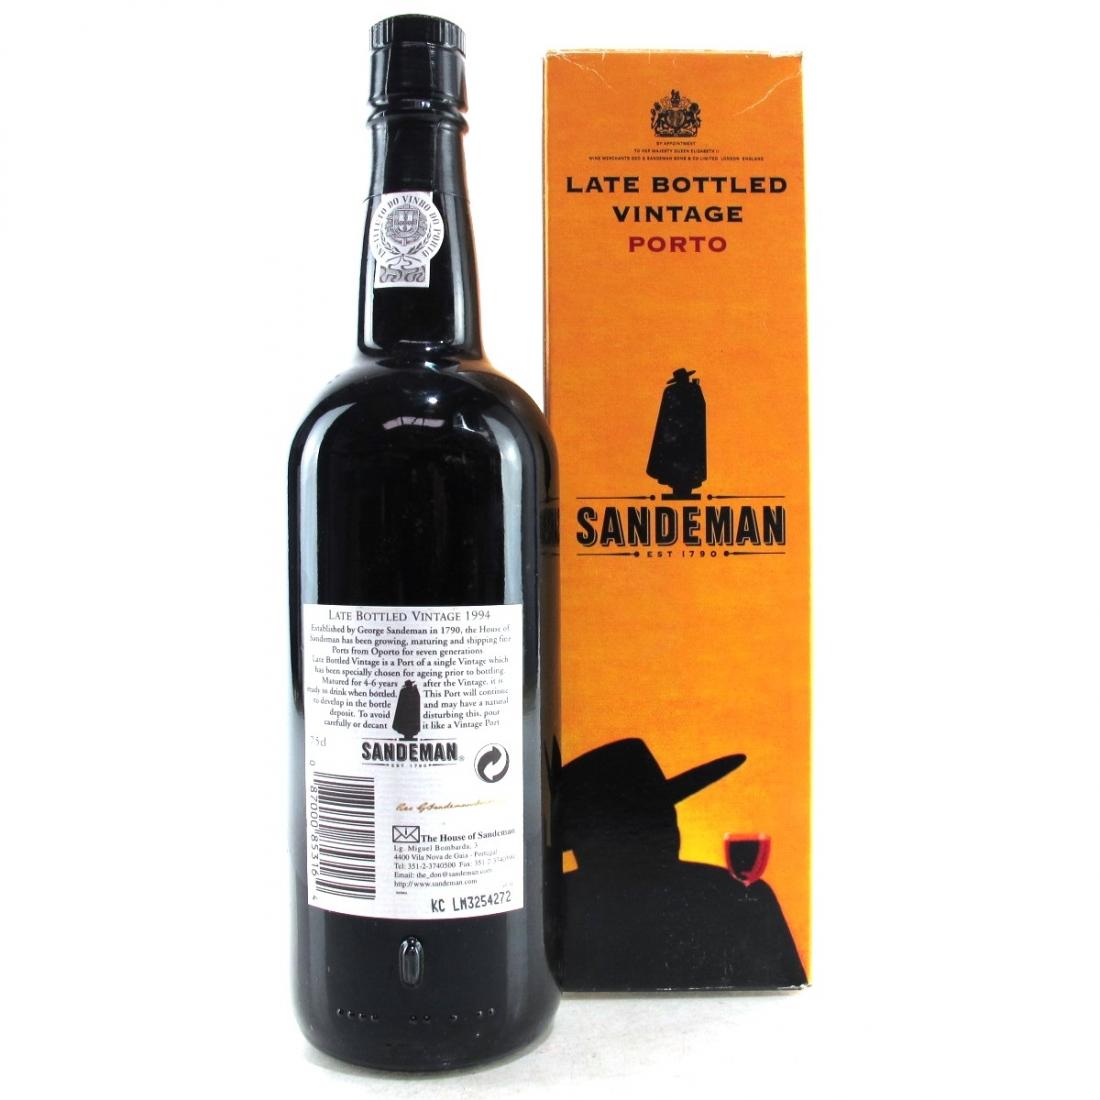 Sandeman's 1994 LBV Port